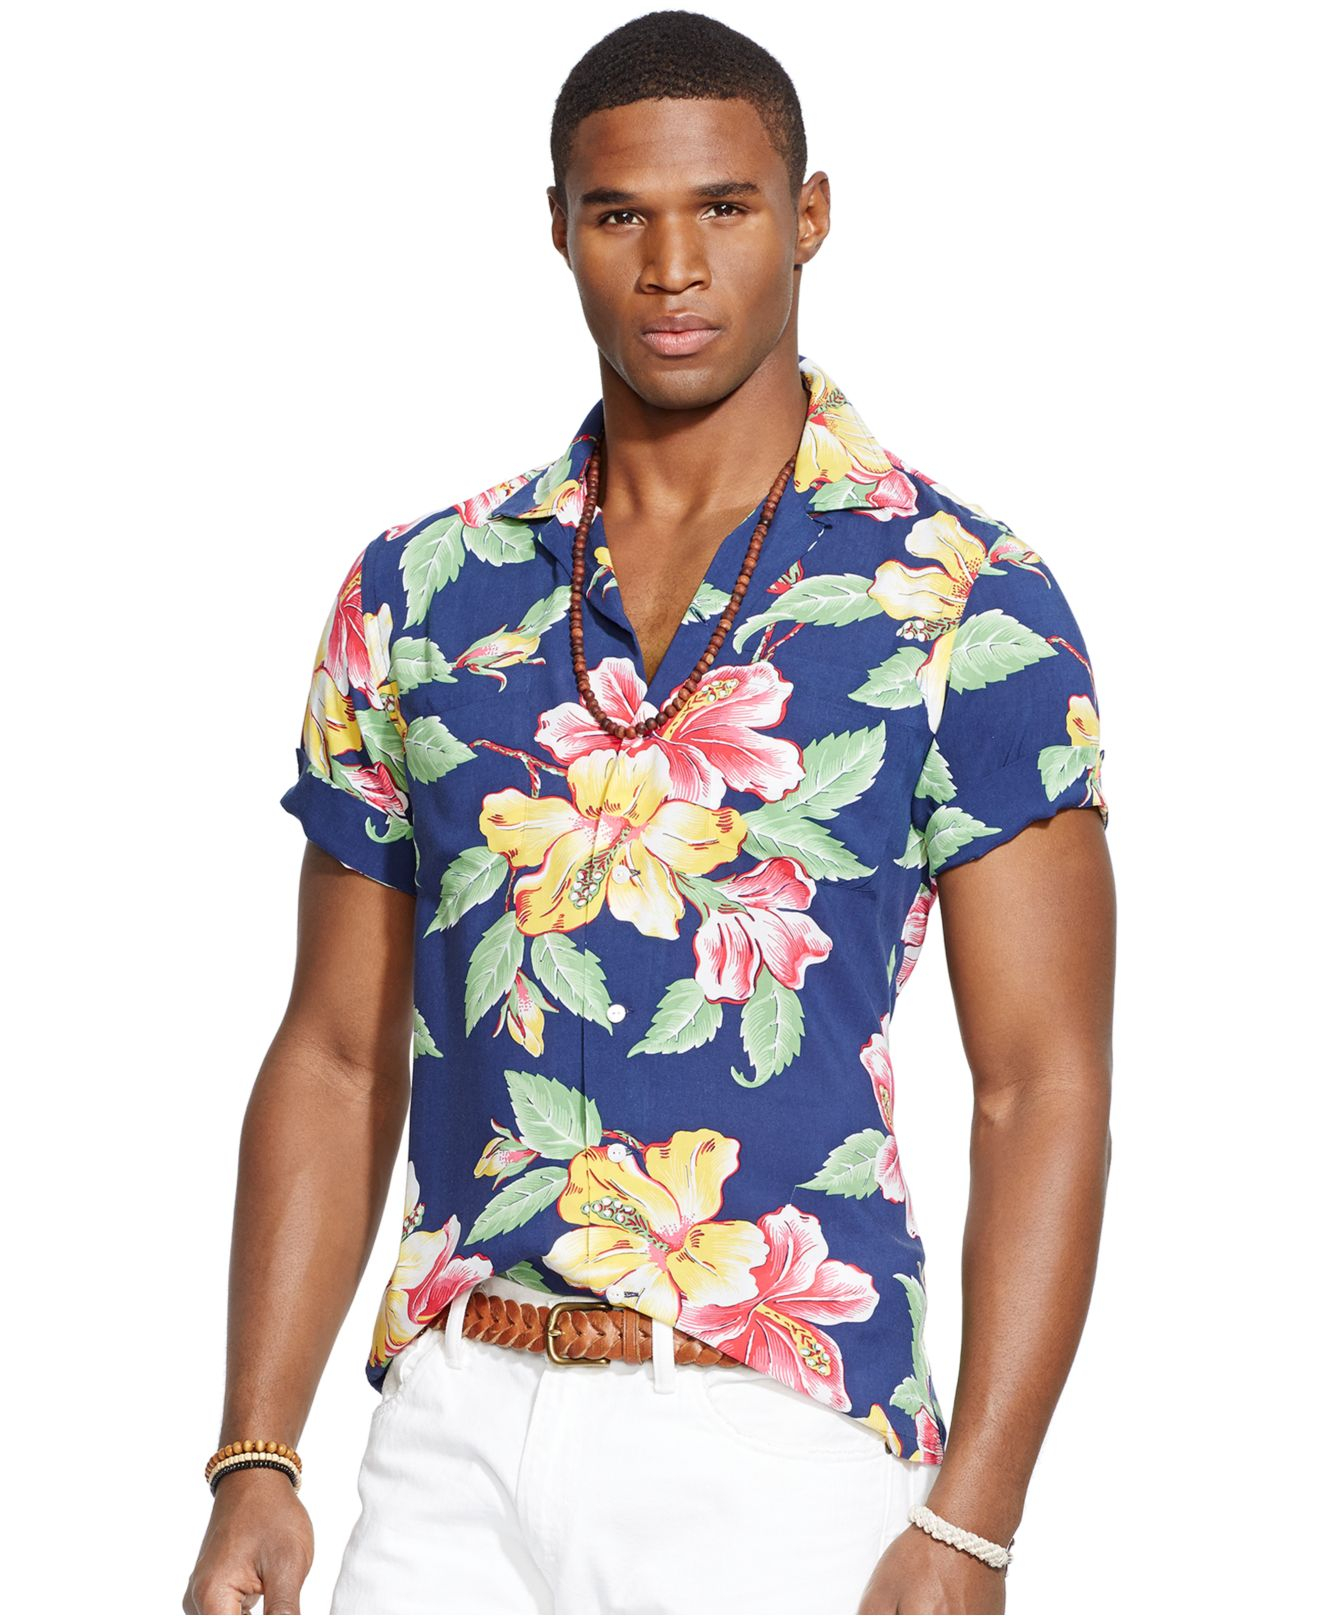 a7f42352db4cb Lyst - Polo Ralph Lauren Slim-fit Hibiscus-print Camp Shirt in Blue ...